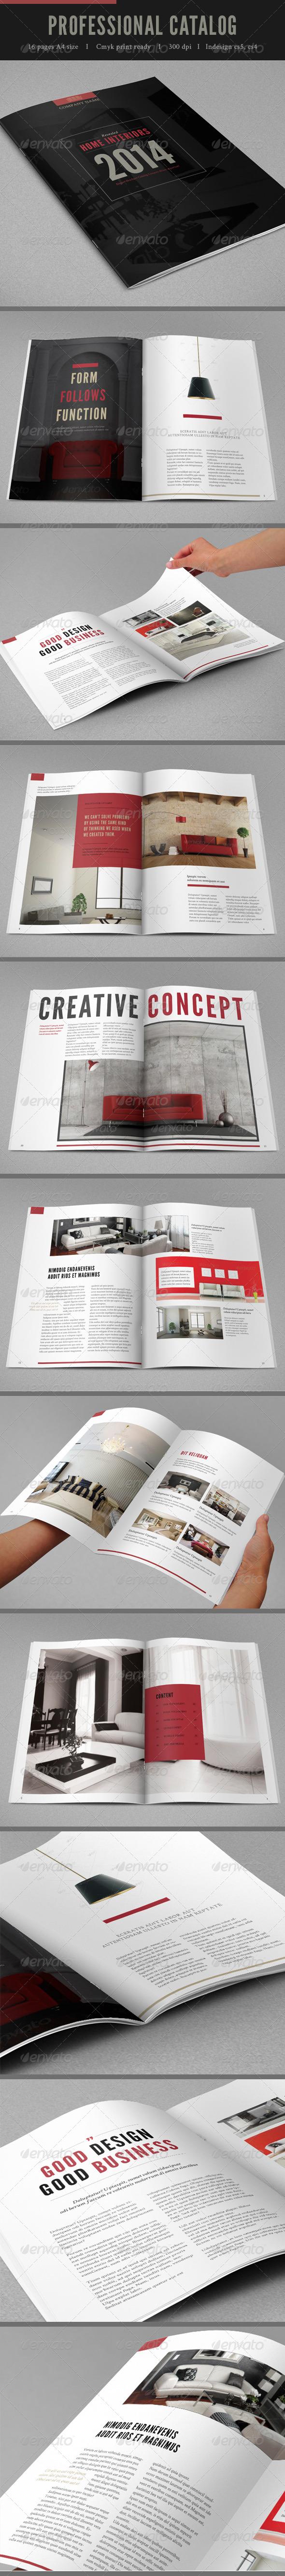 GraphicRiver Professional Brochure Catalog vol II 7751382